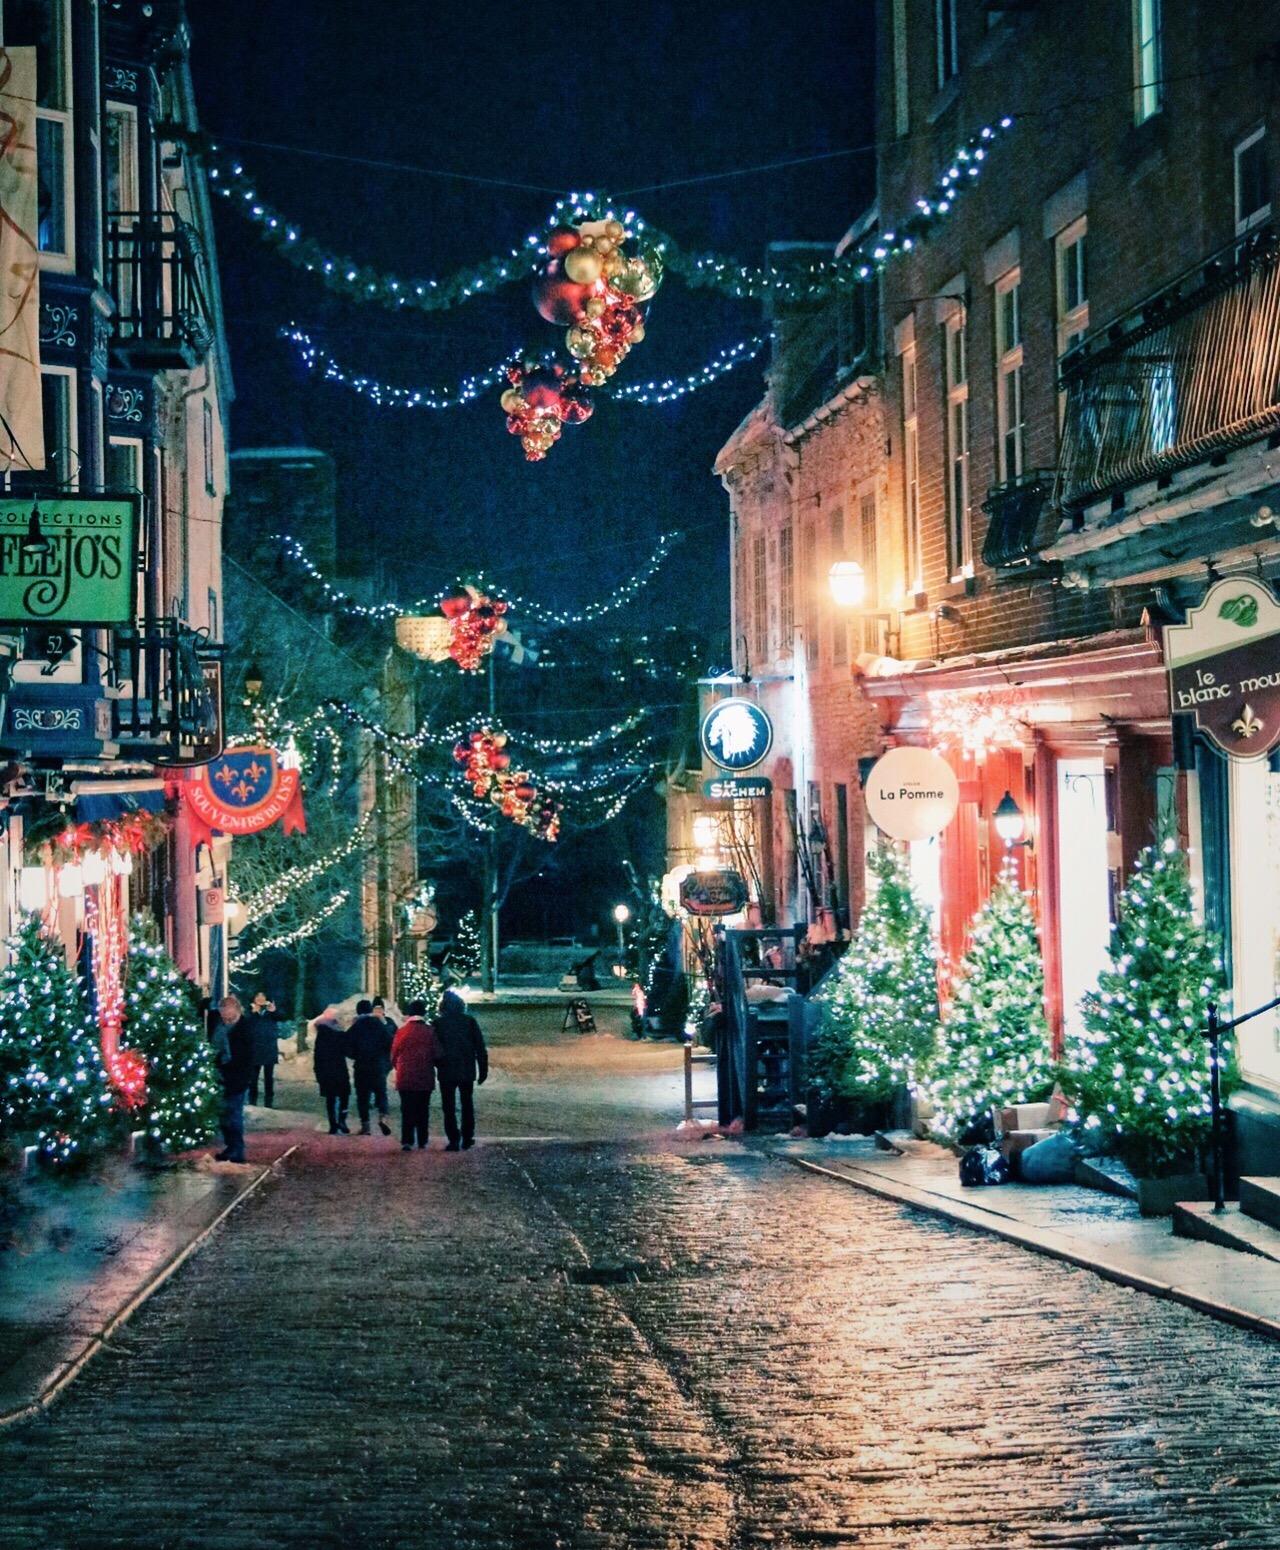 Quebec city street.JPG